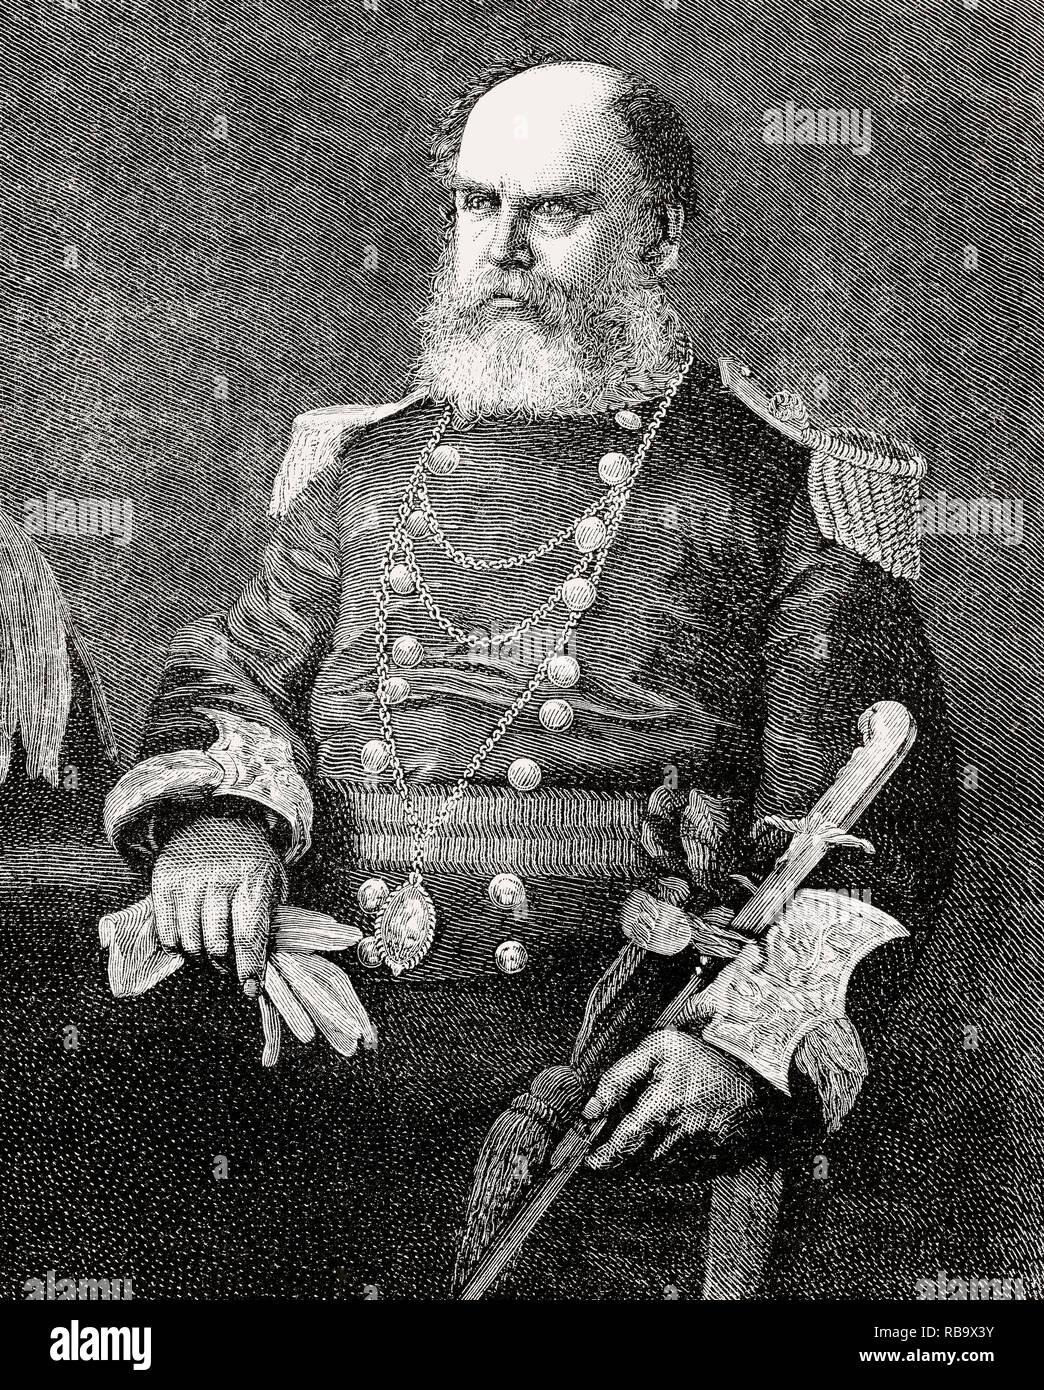 Sir James Falshaw, 1810 – 1889, Lord Provost of Edinburgh - Stock Image